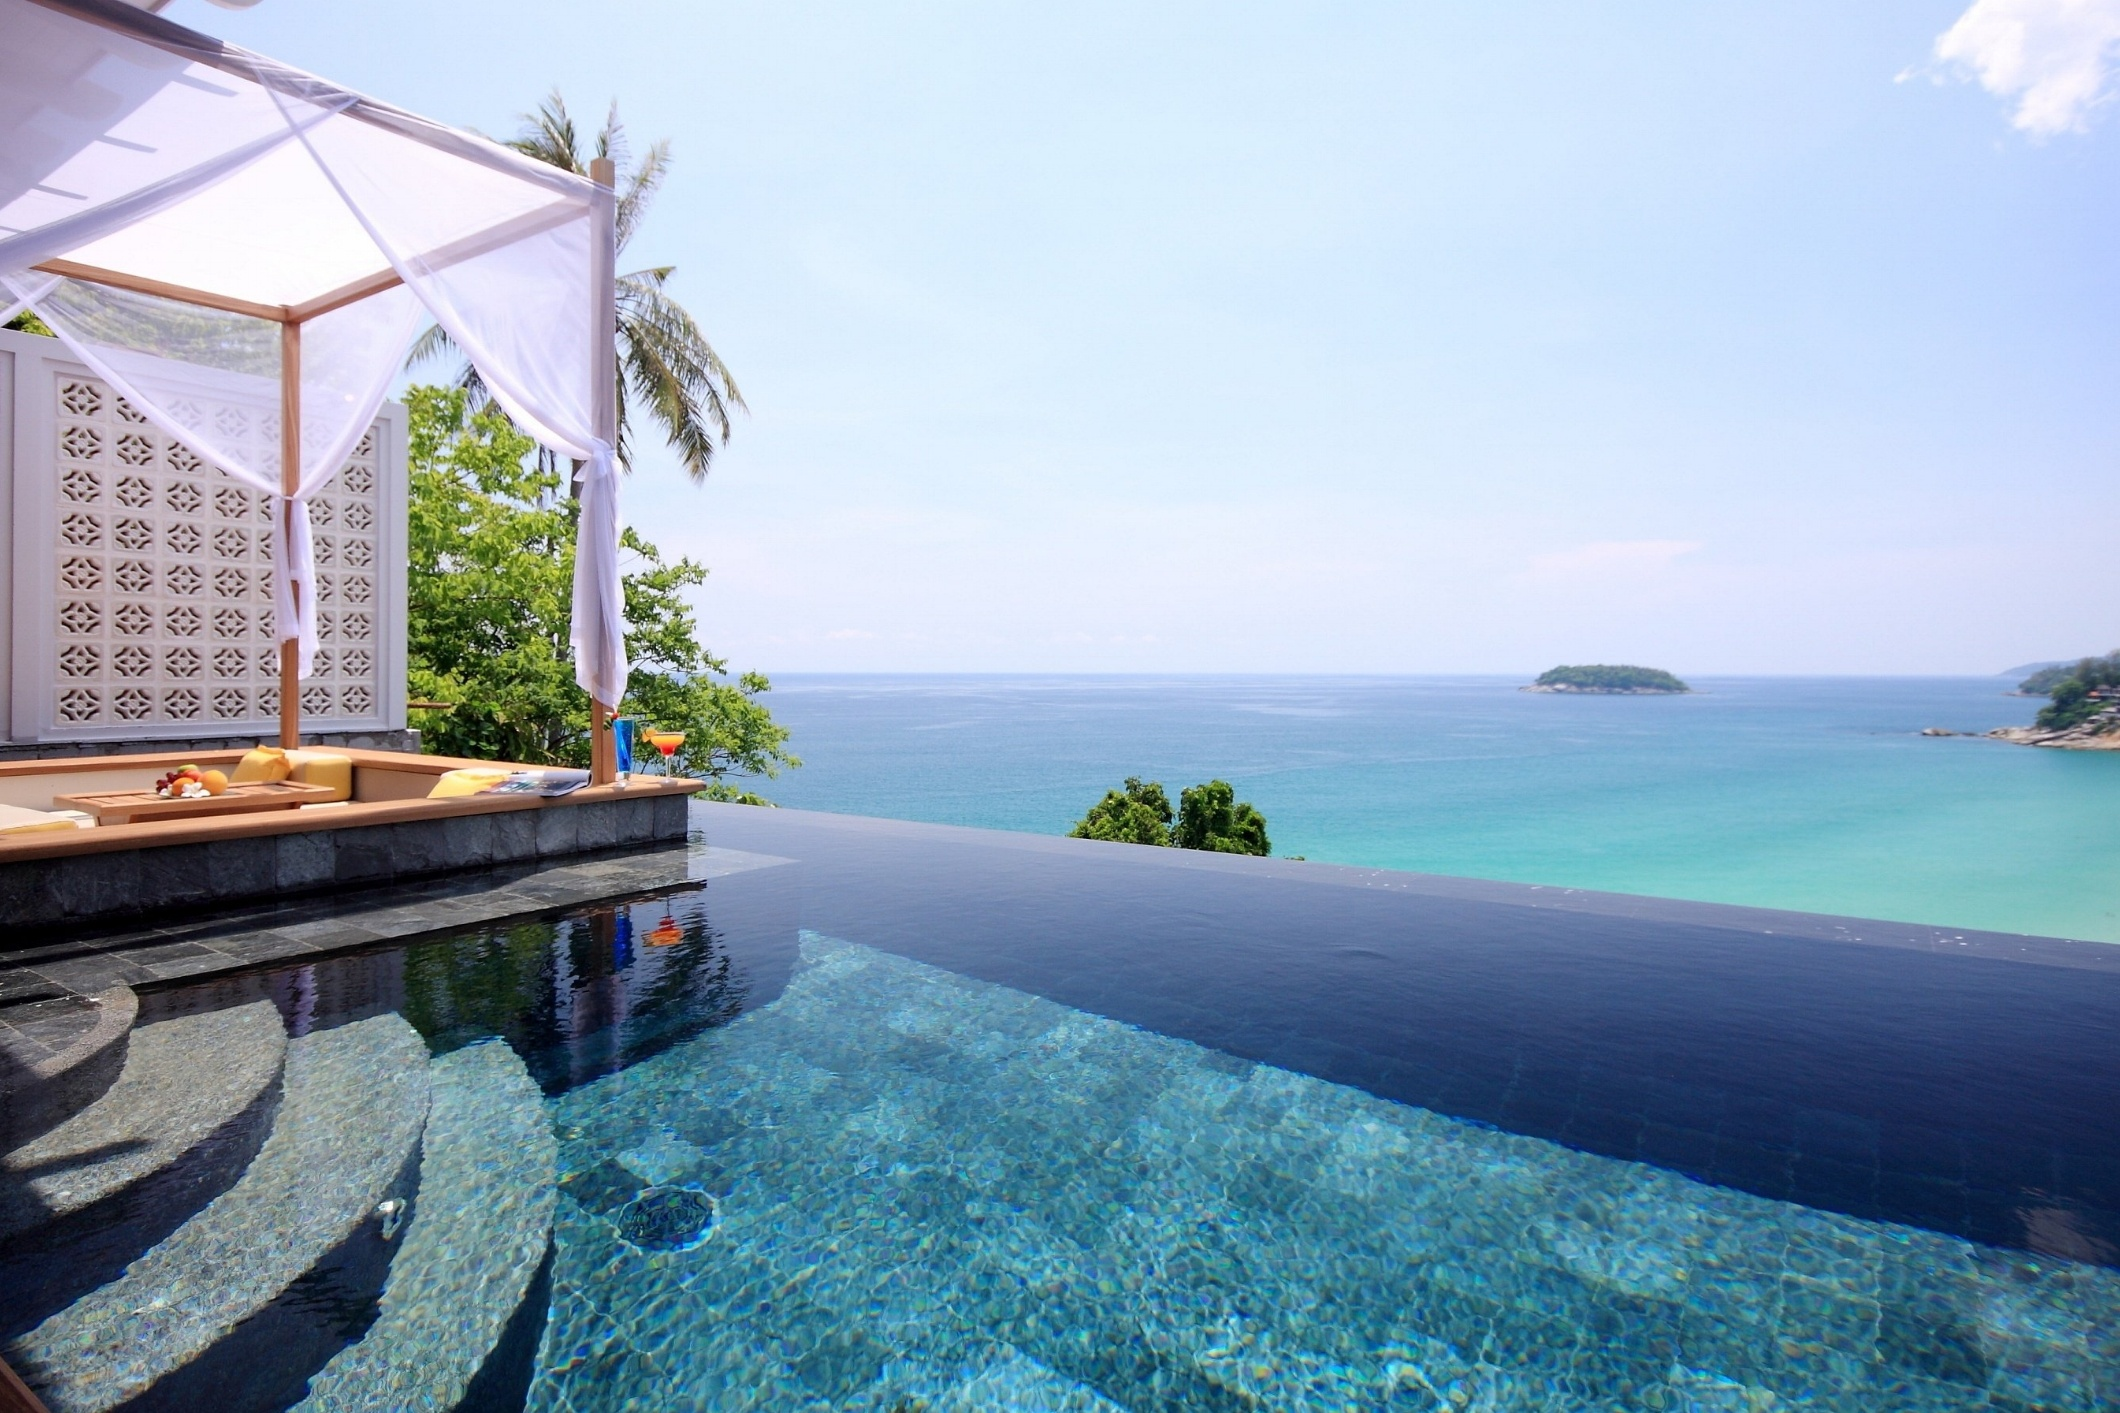 thailand-beach-resorts-wallpaper-1-890310-edited